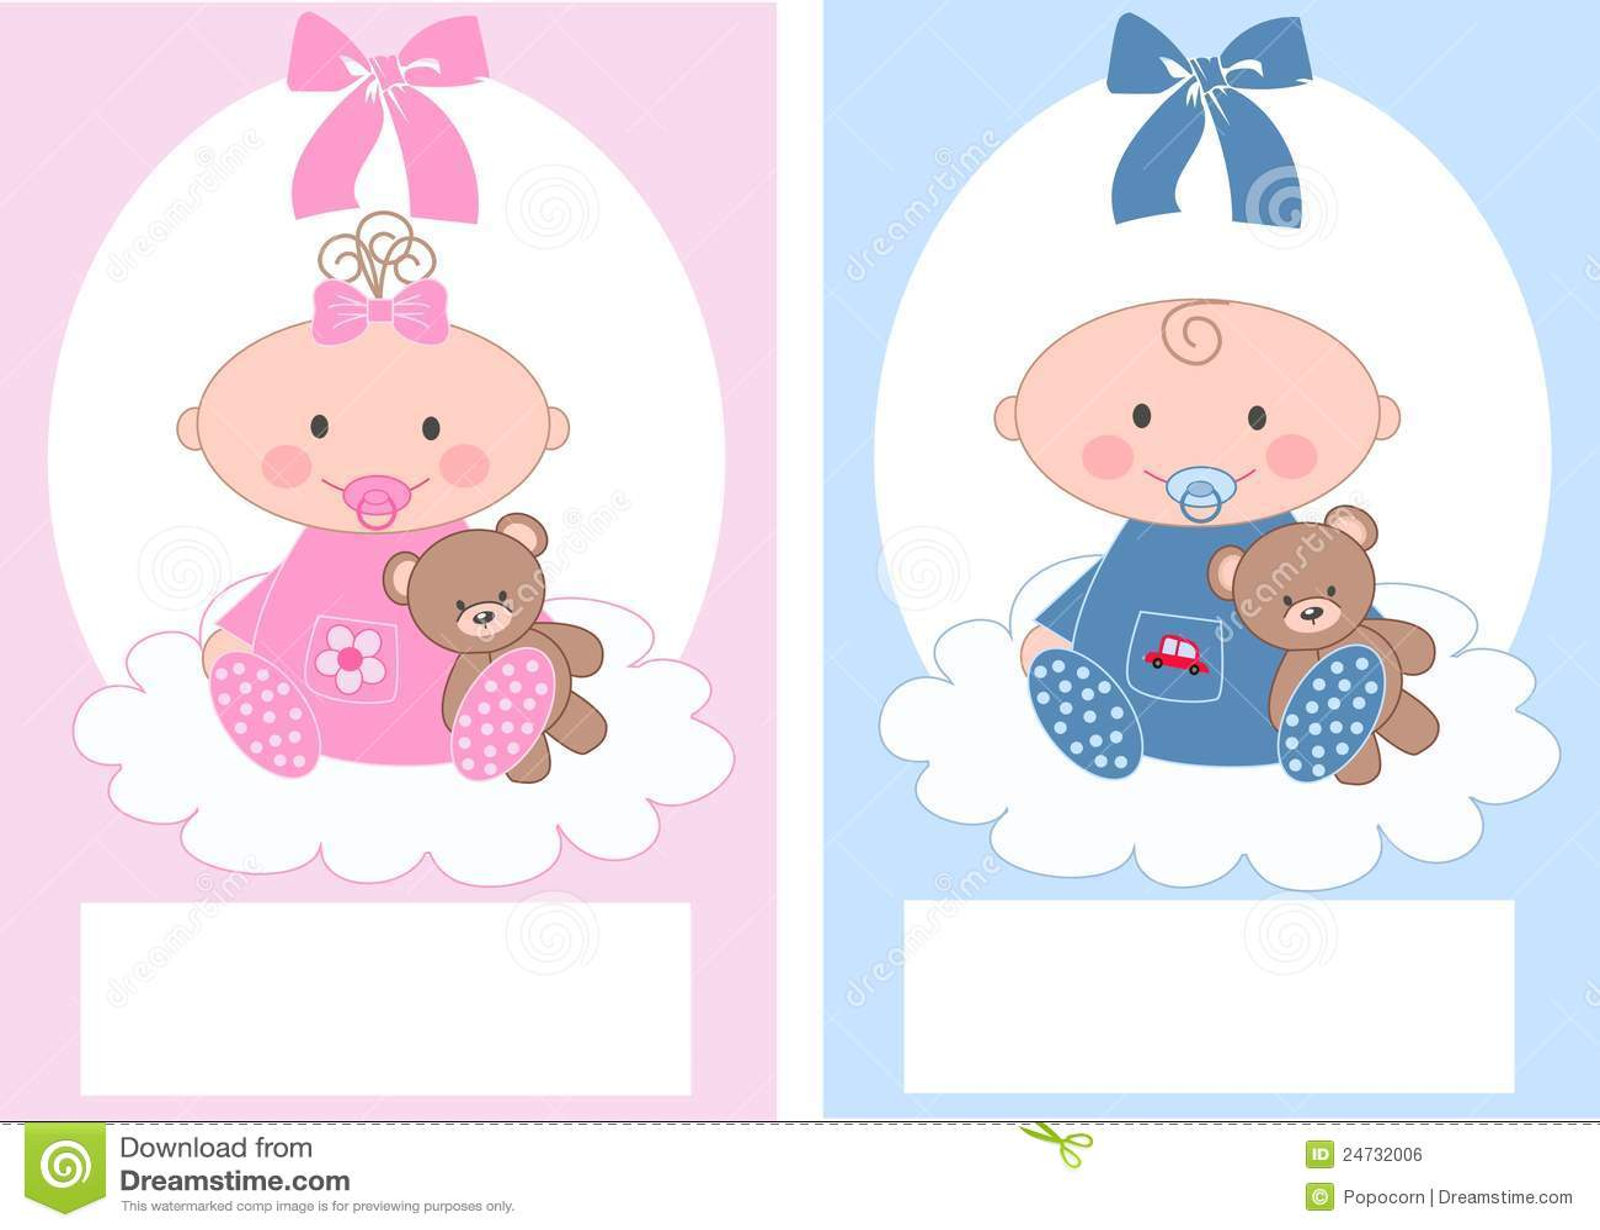 Newborn Baby Royalty Free Stock Image - Image: 24732006